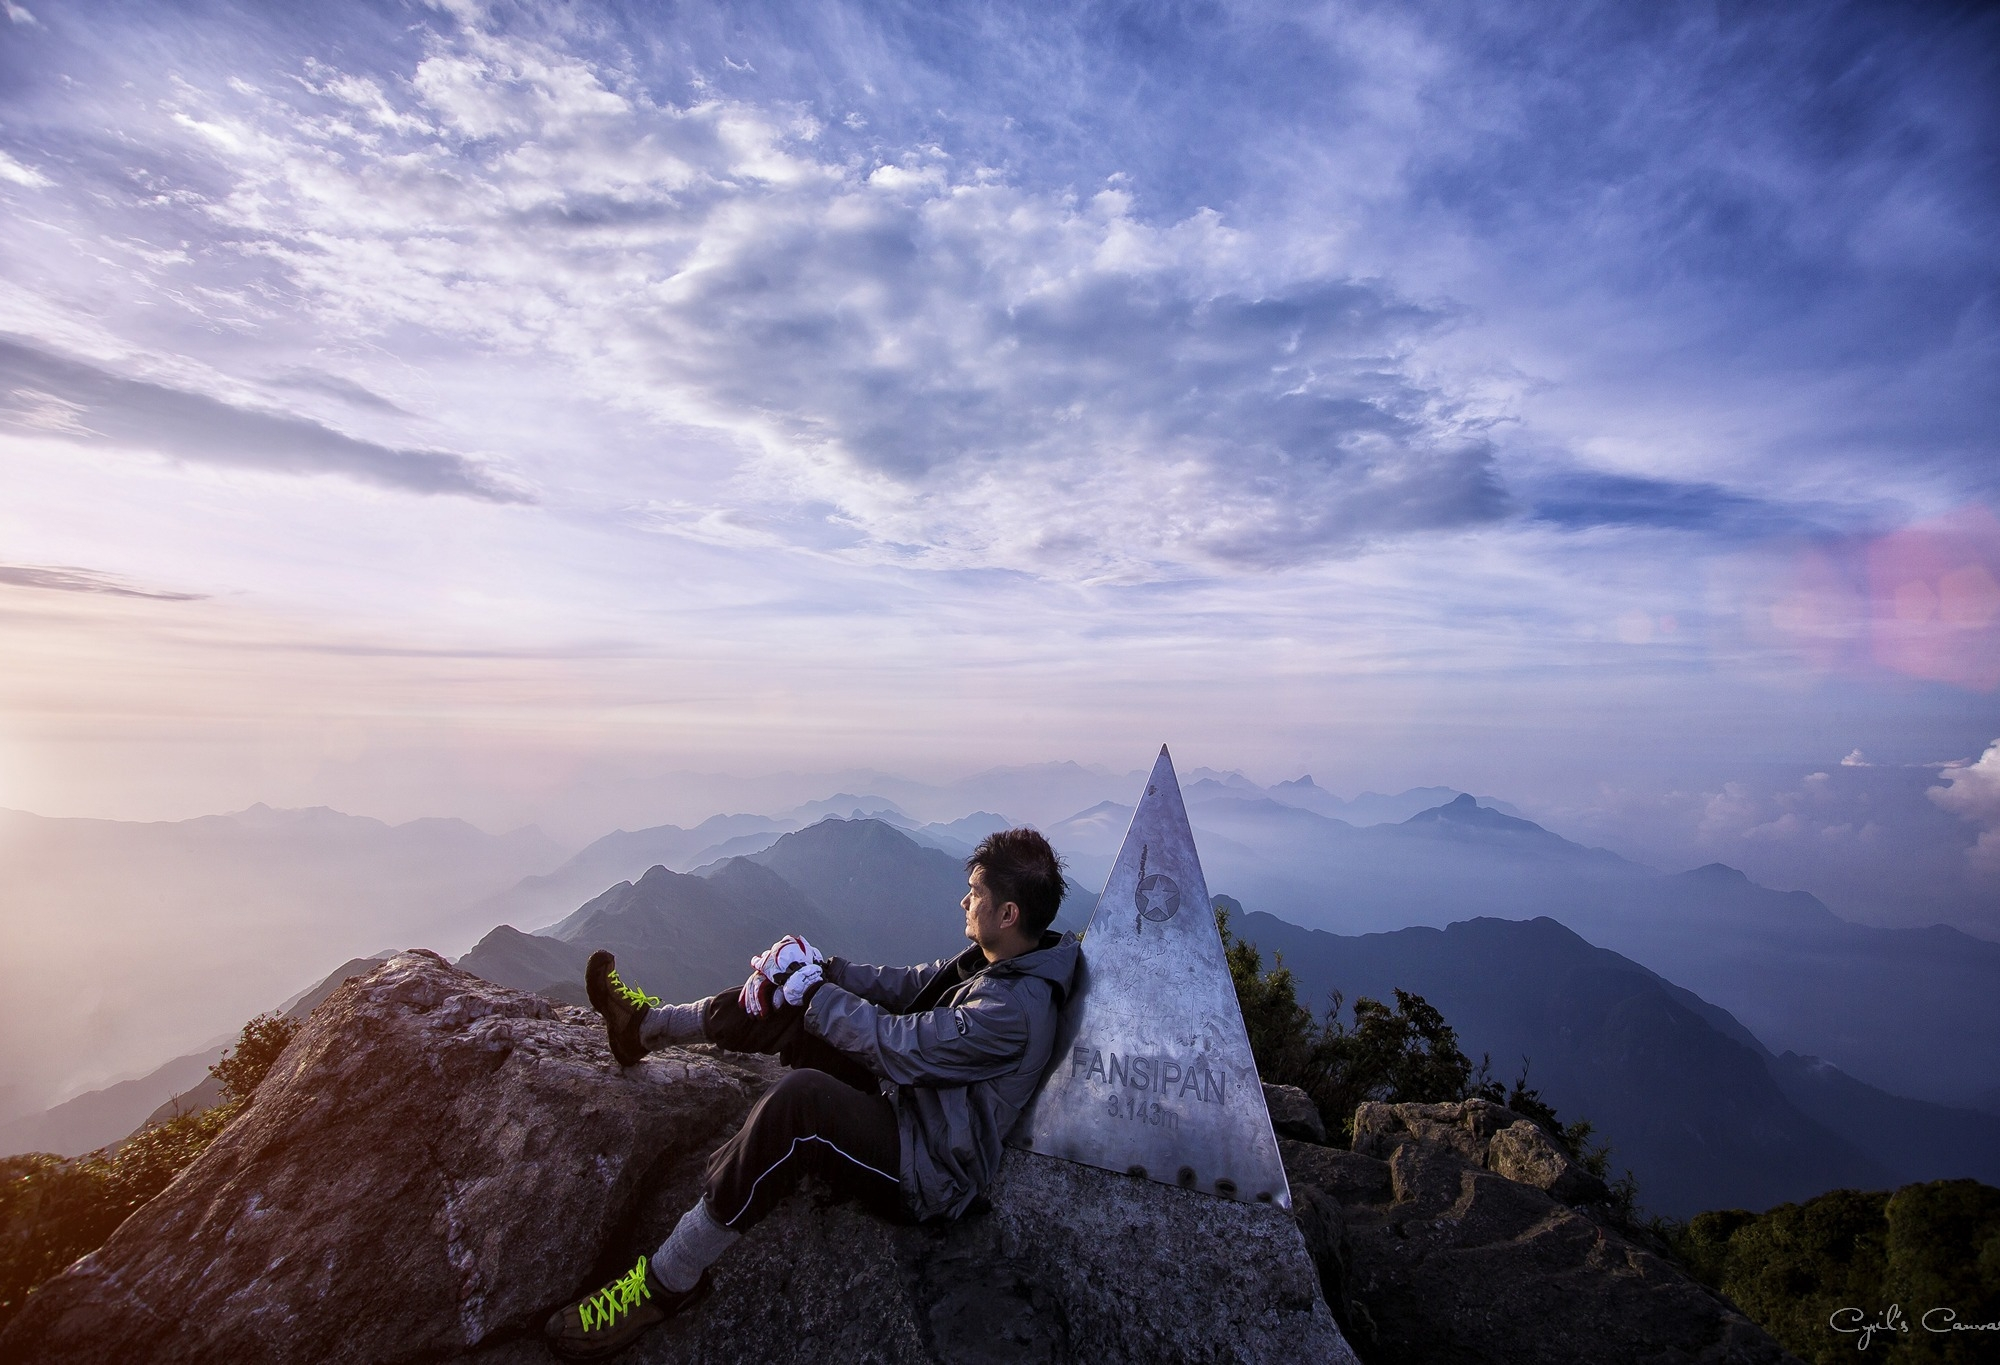 Kết quả hình ảnh cho fansipan mountain trek danger